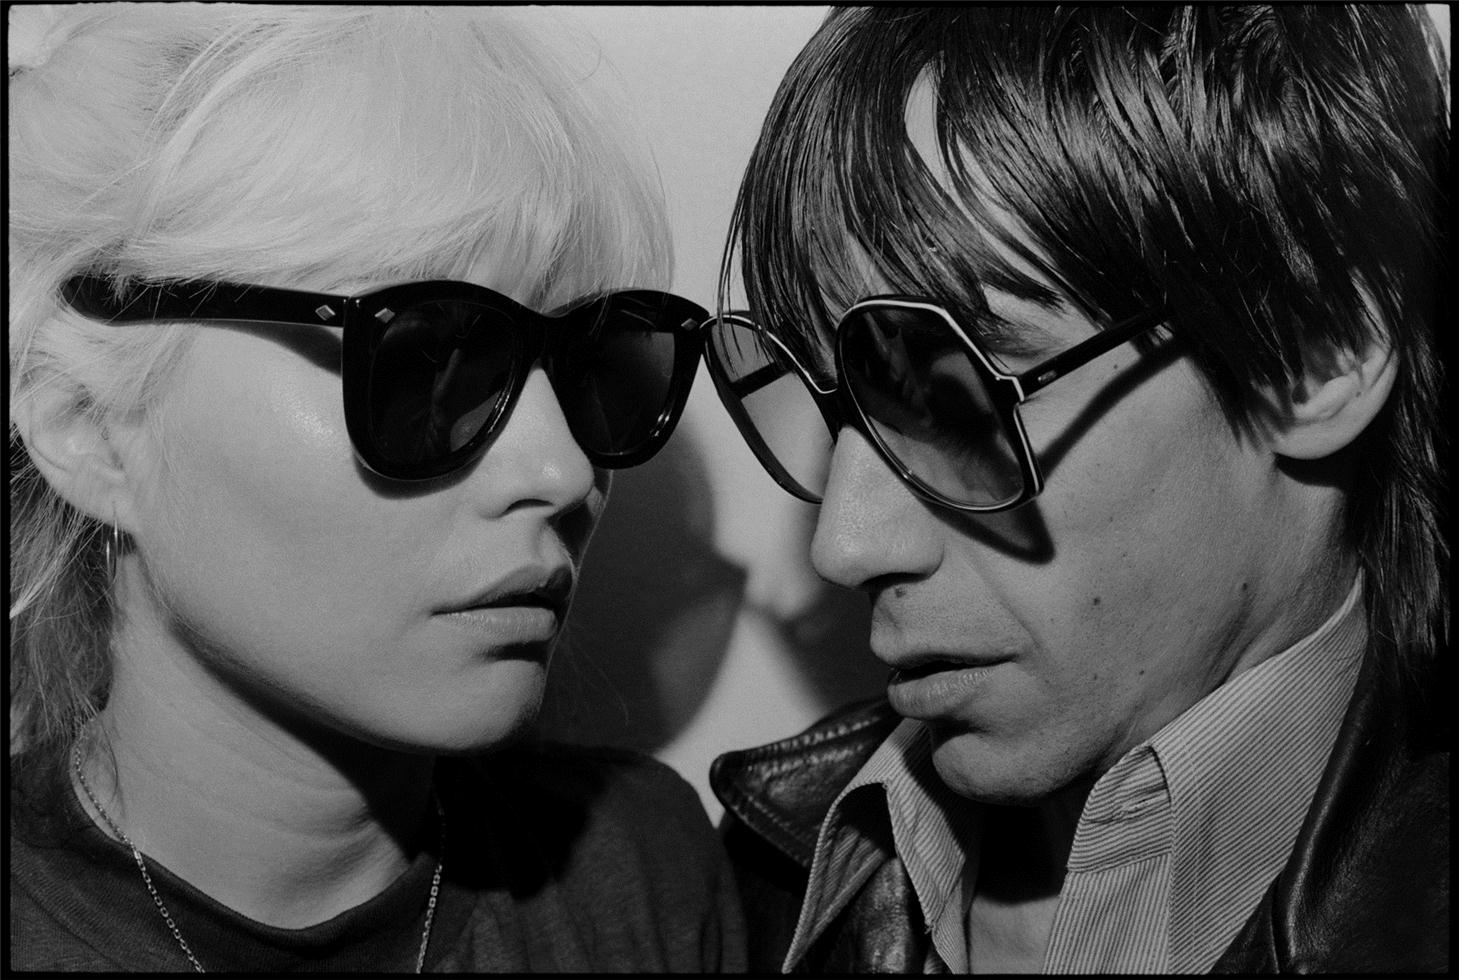 1977. Дебби Харри и Игги Поп